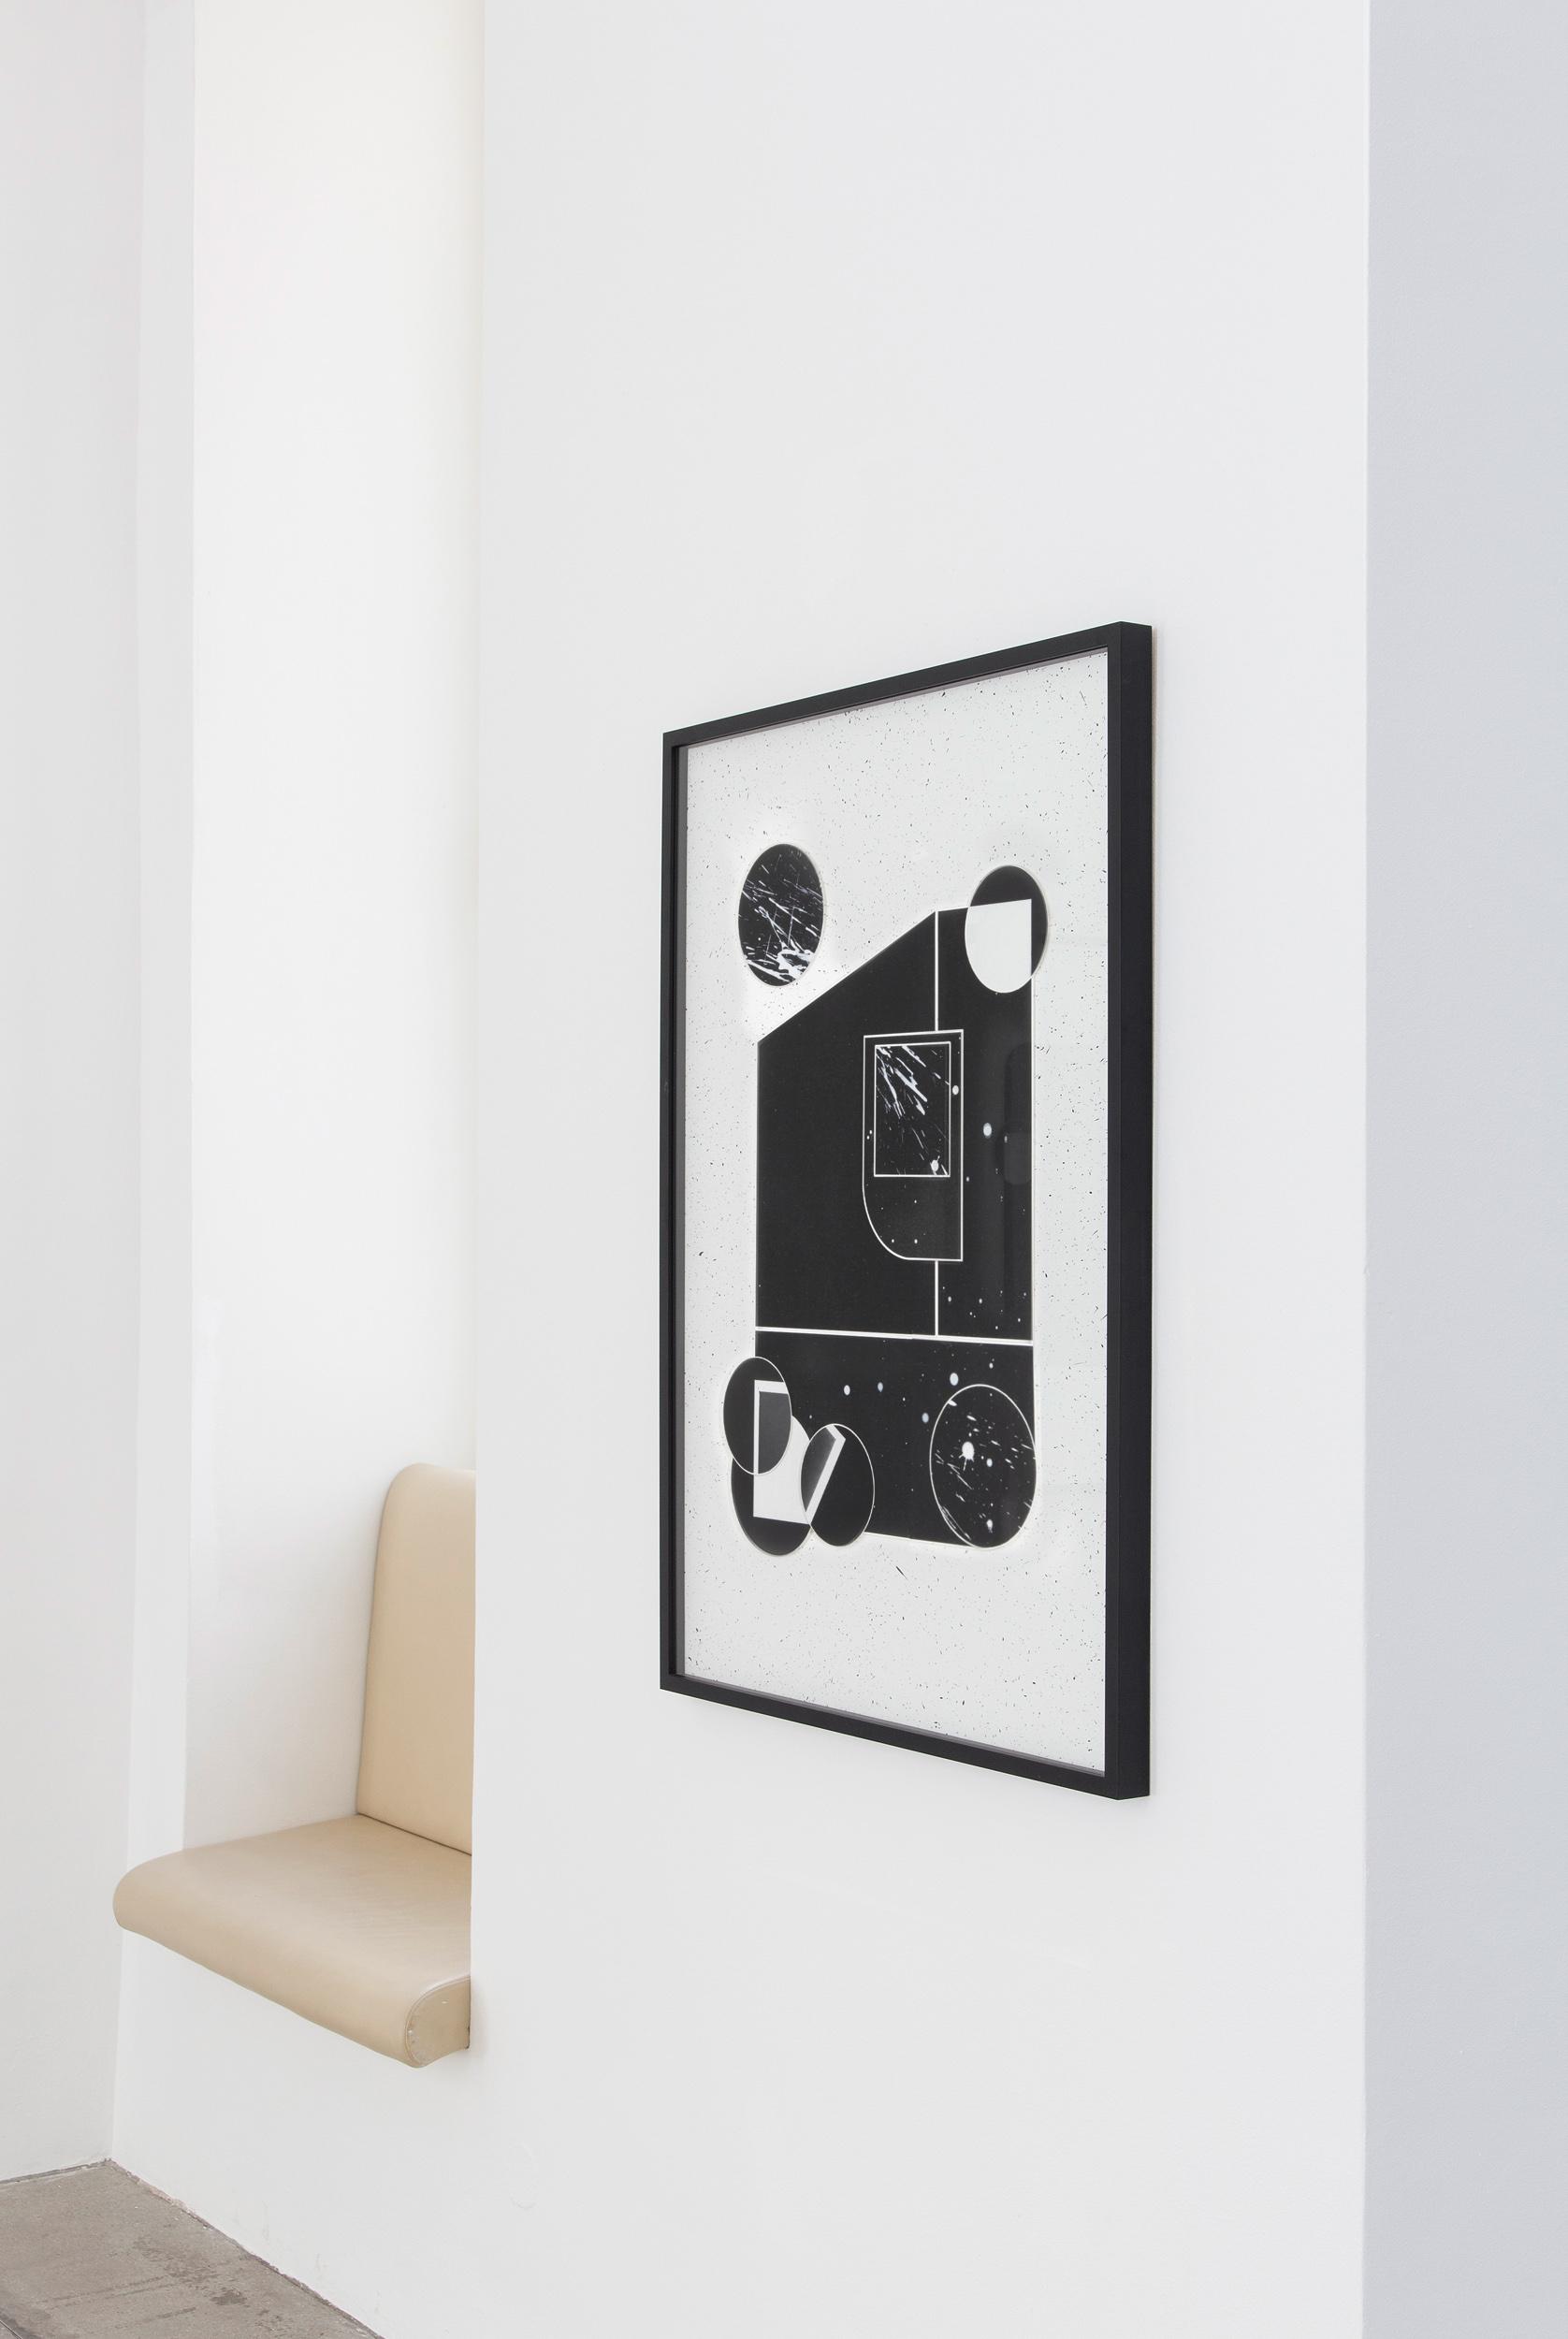 contemporary, visual, conceptual, modern, art, artistical